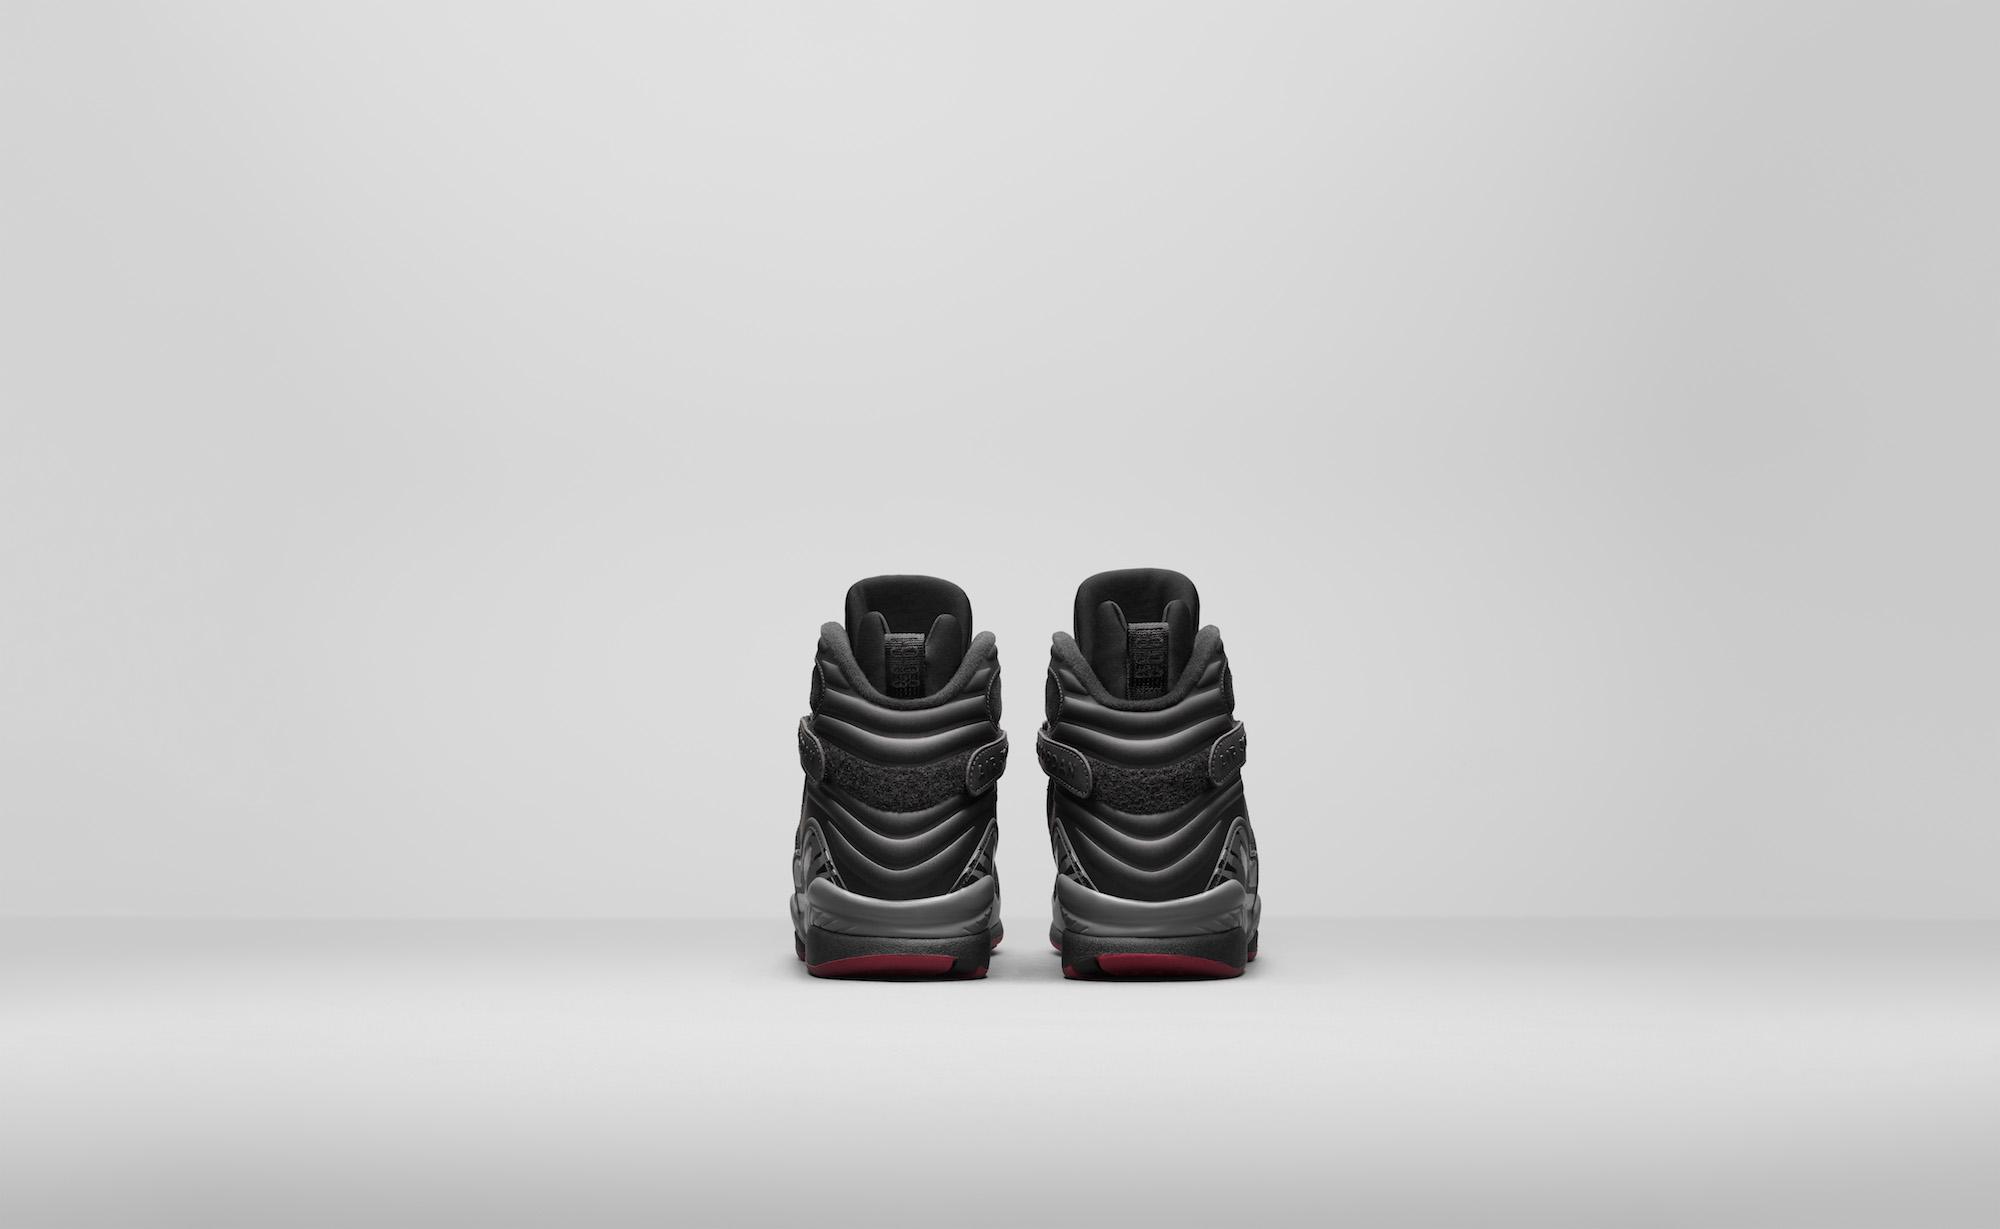 94823f7590d7 Air Jordan 8 cement 7 - WearTesters